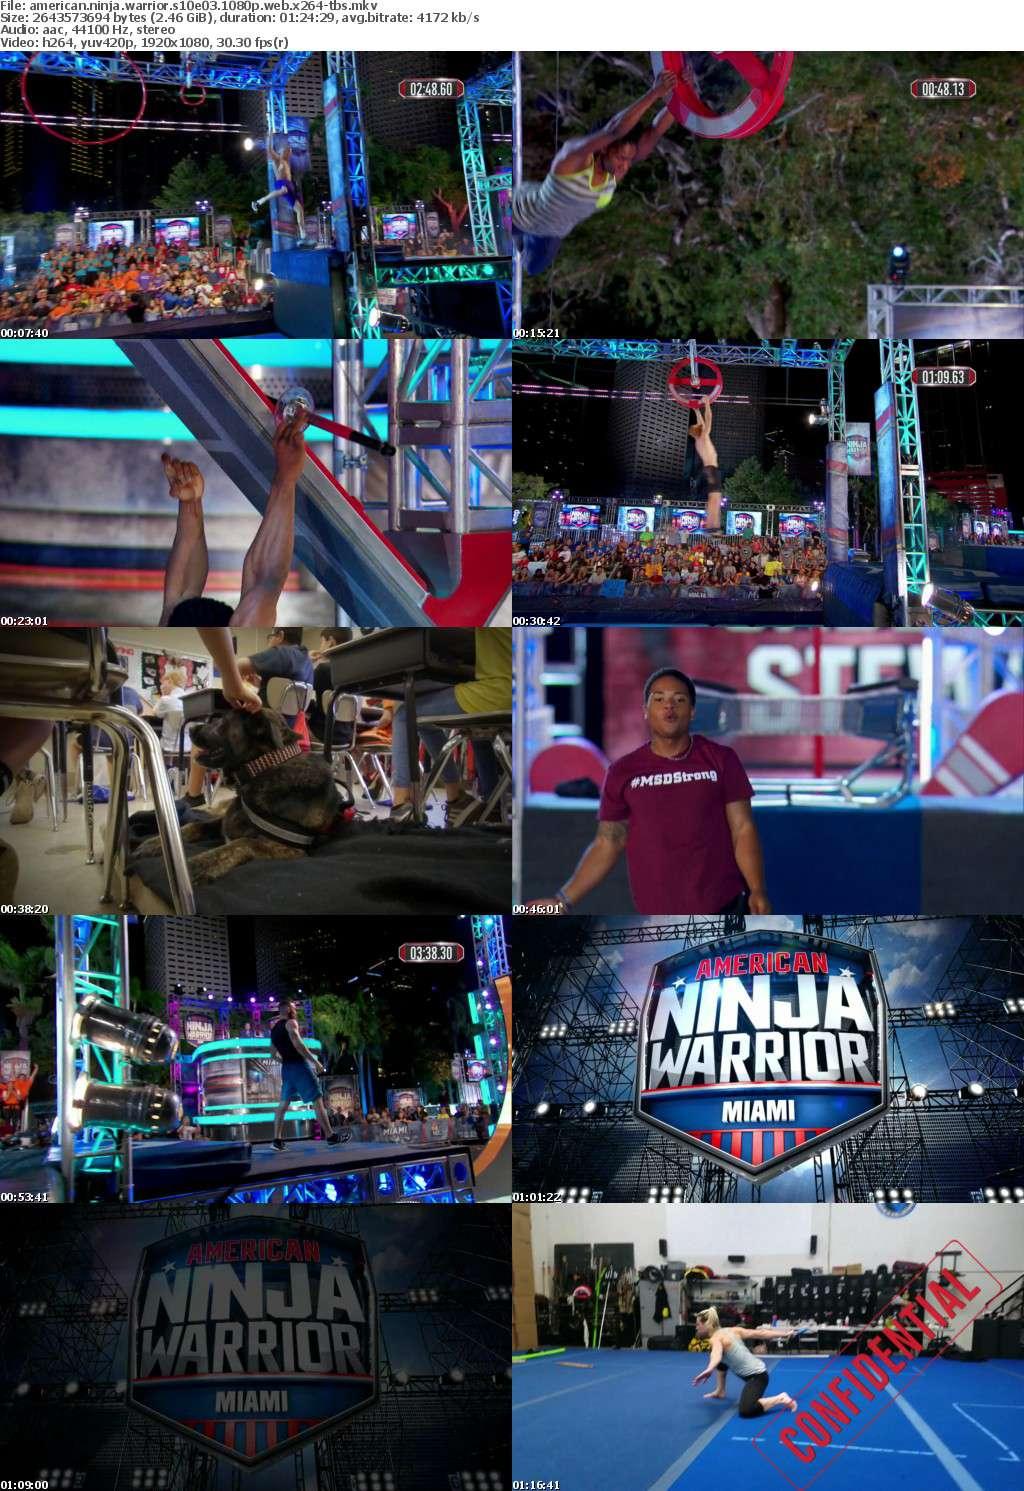 American Ninja Warrior S10E03 1080p WEB x264-TBS